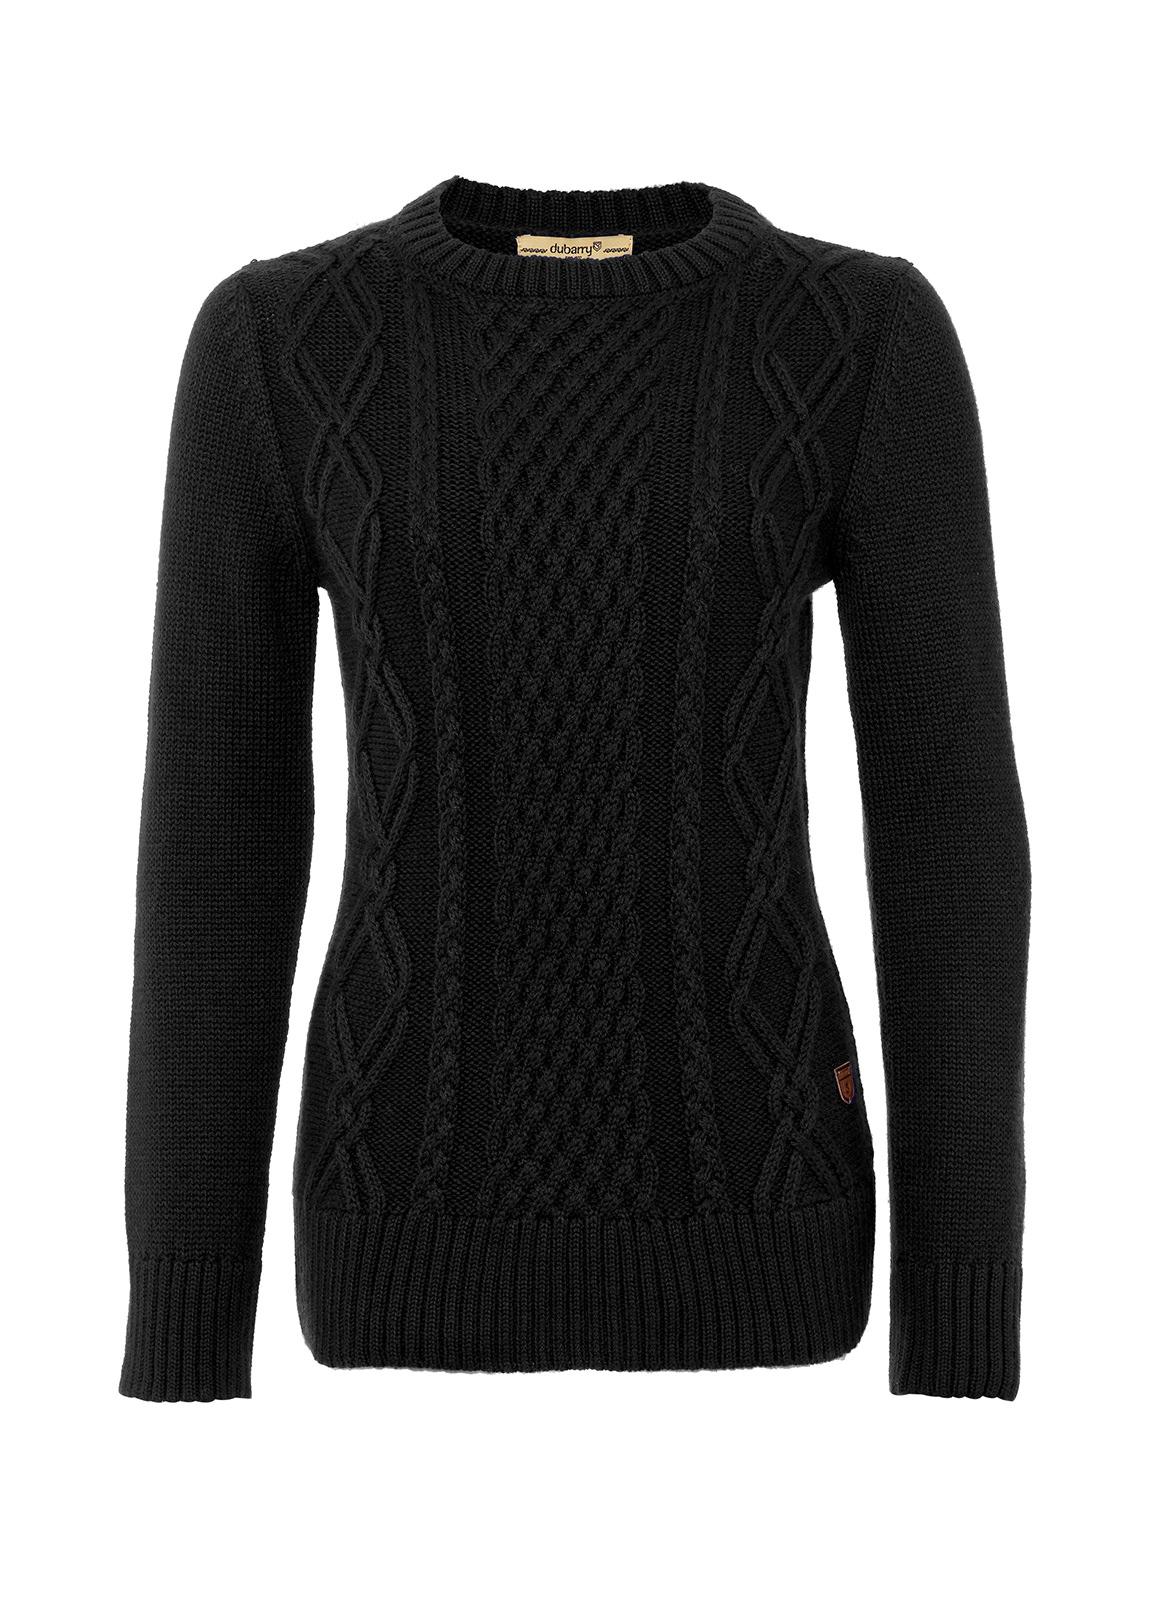 Lisloughrey Sweater - Black